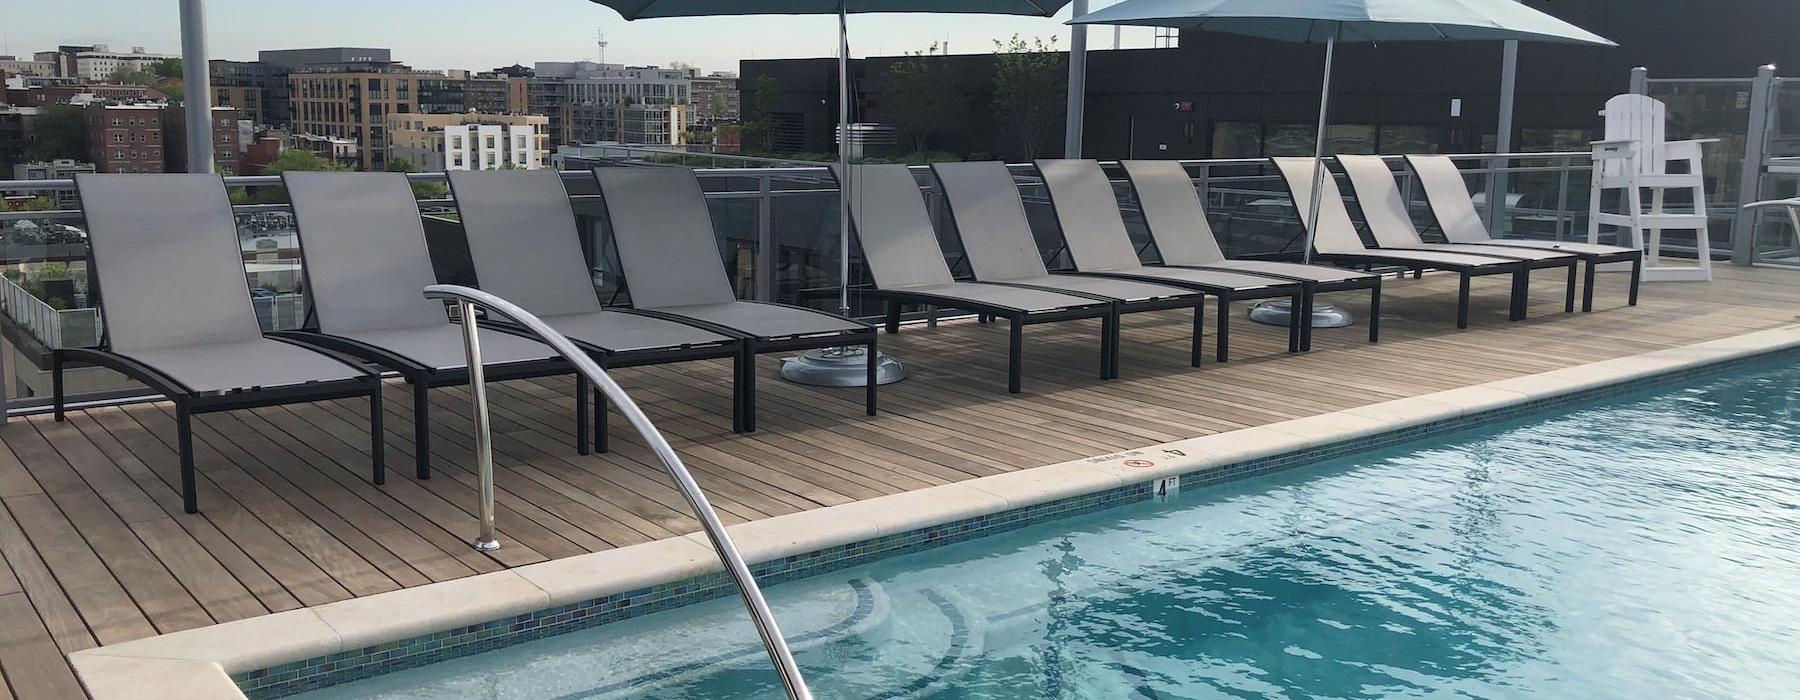 Sonnet Rooftop Pool